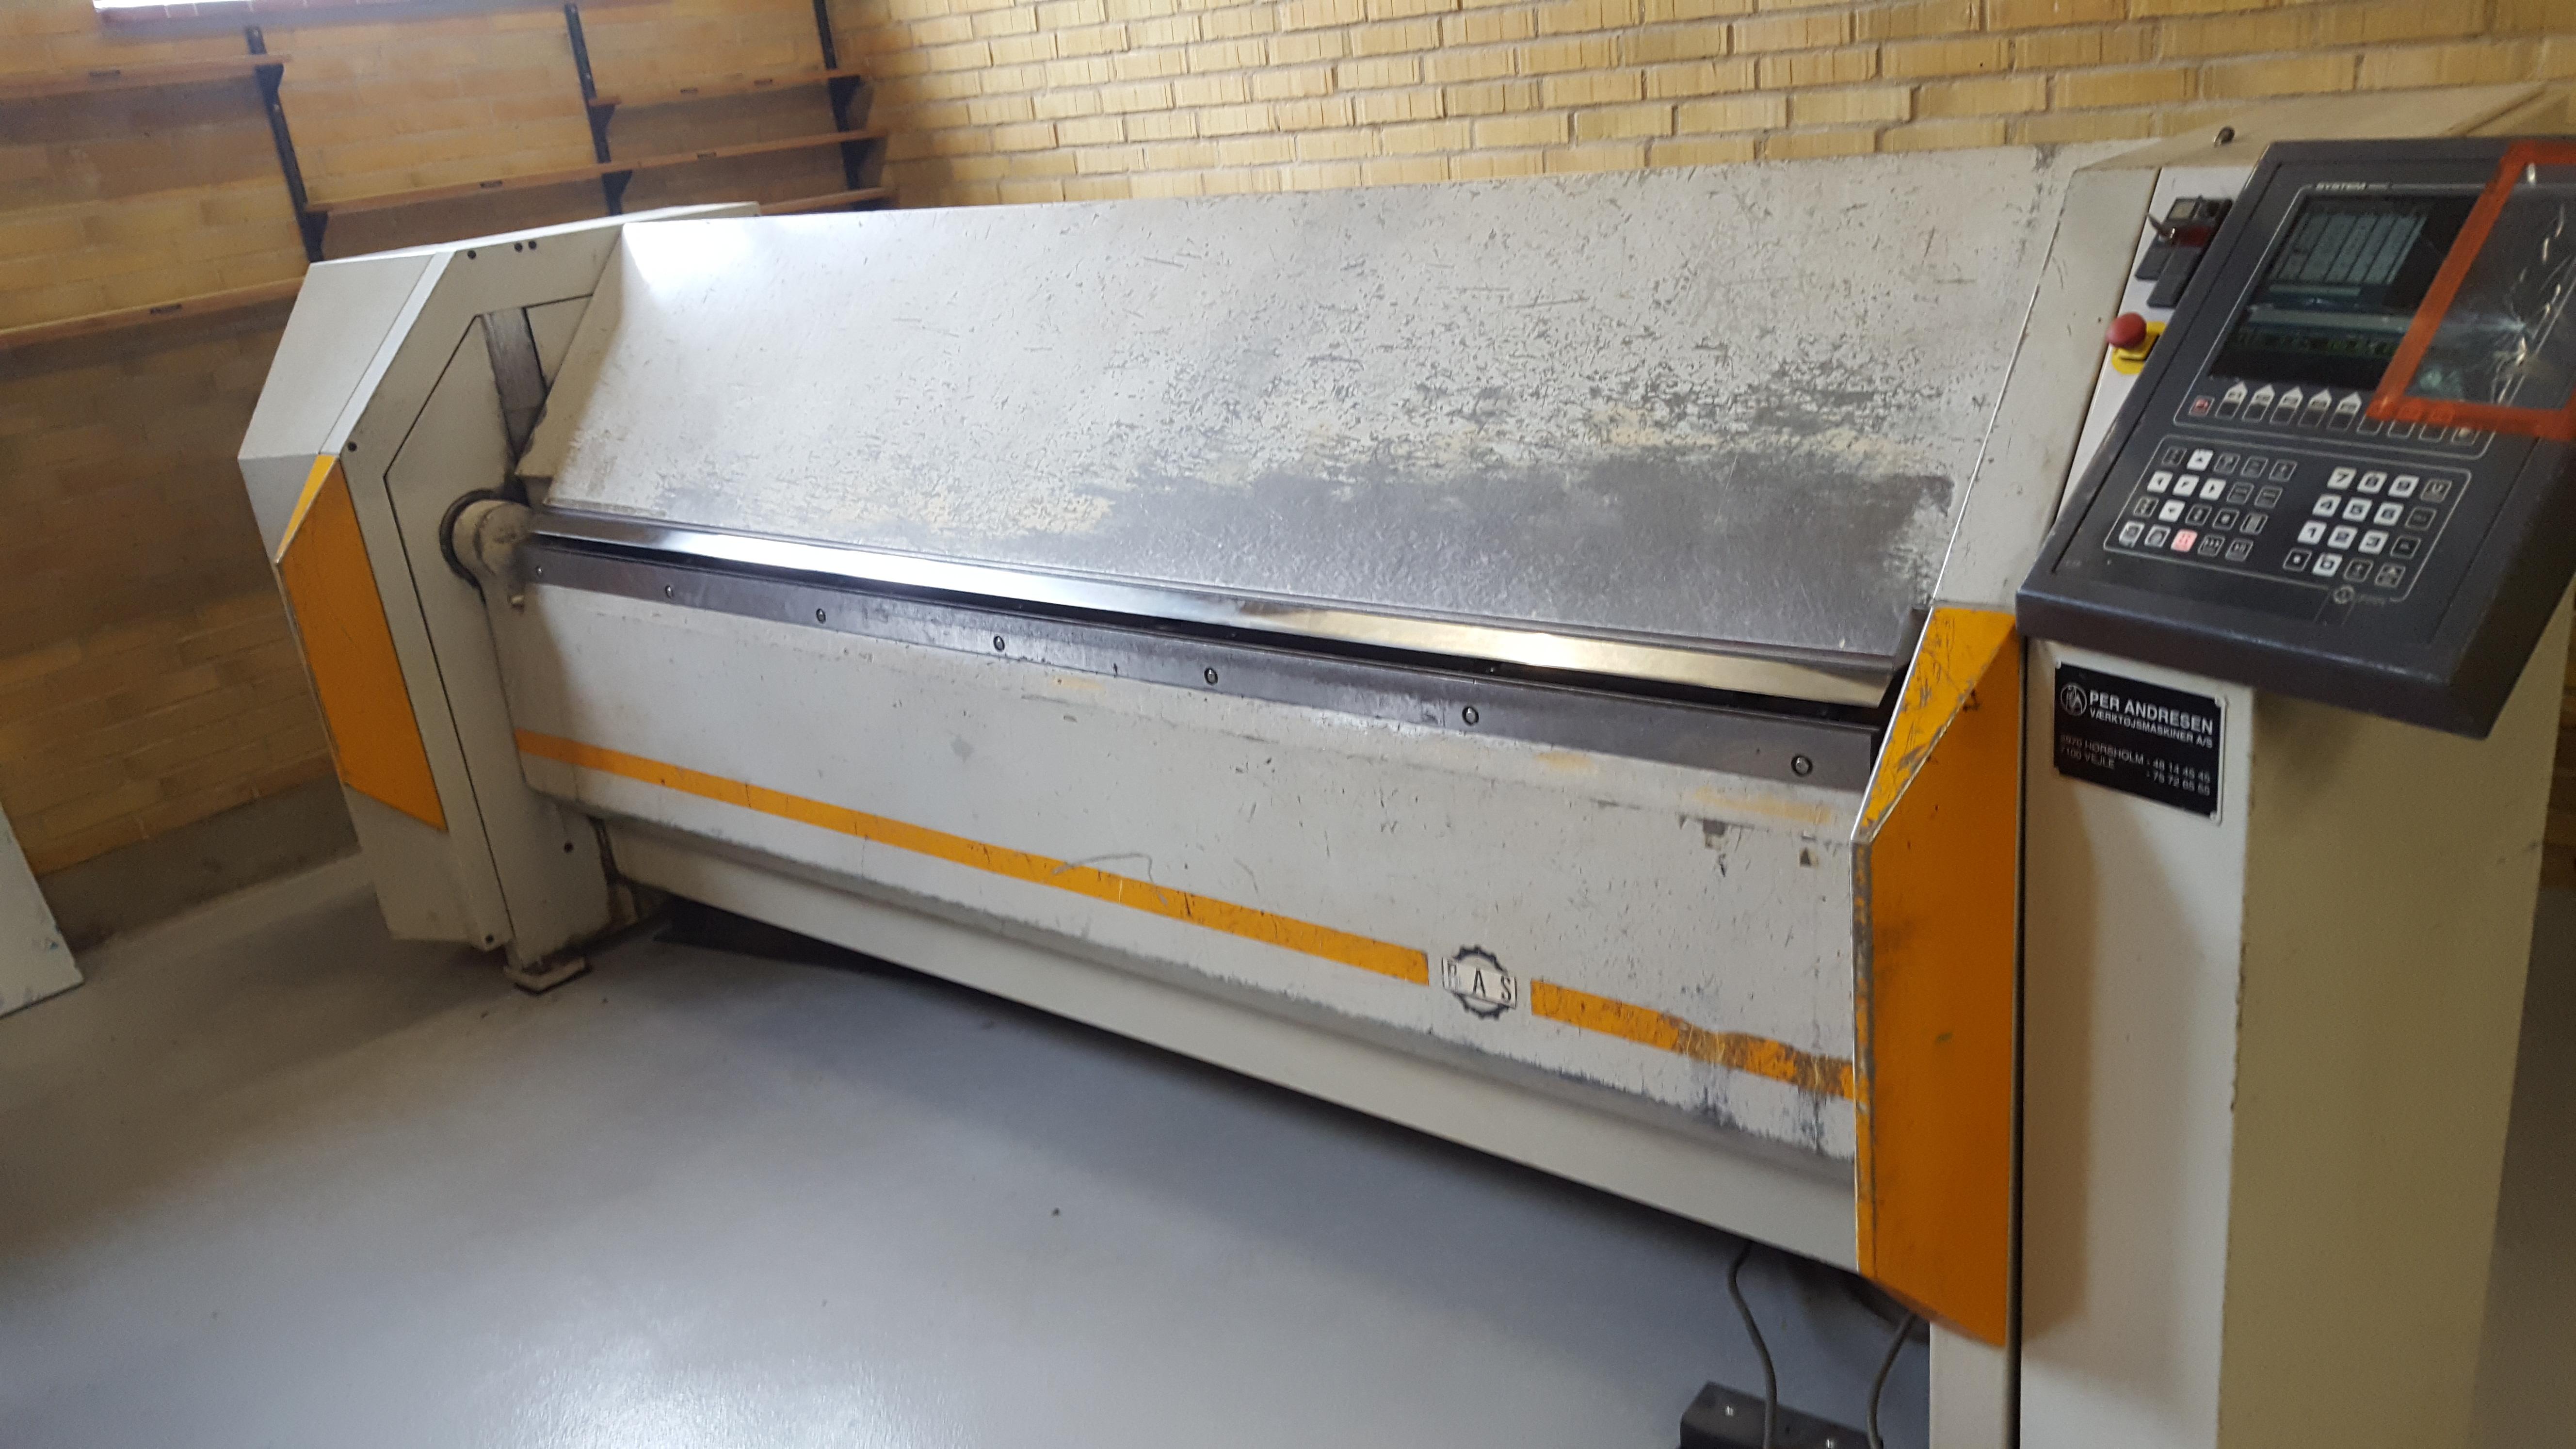 Pladebearbejdnings maskiner købes/sælges - Metal Supply DK